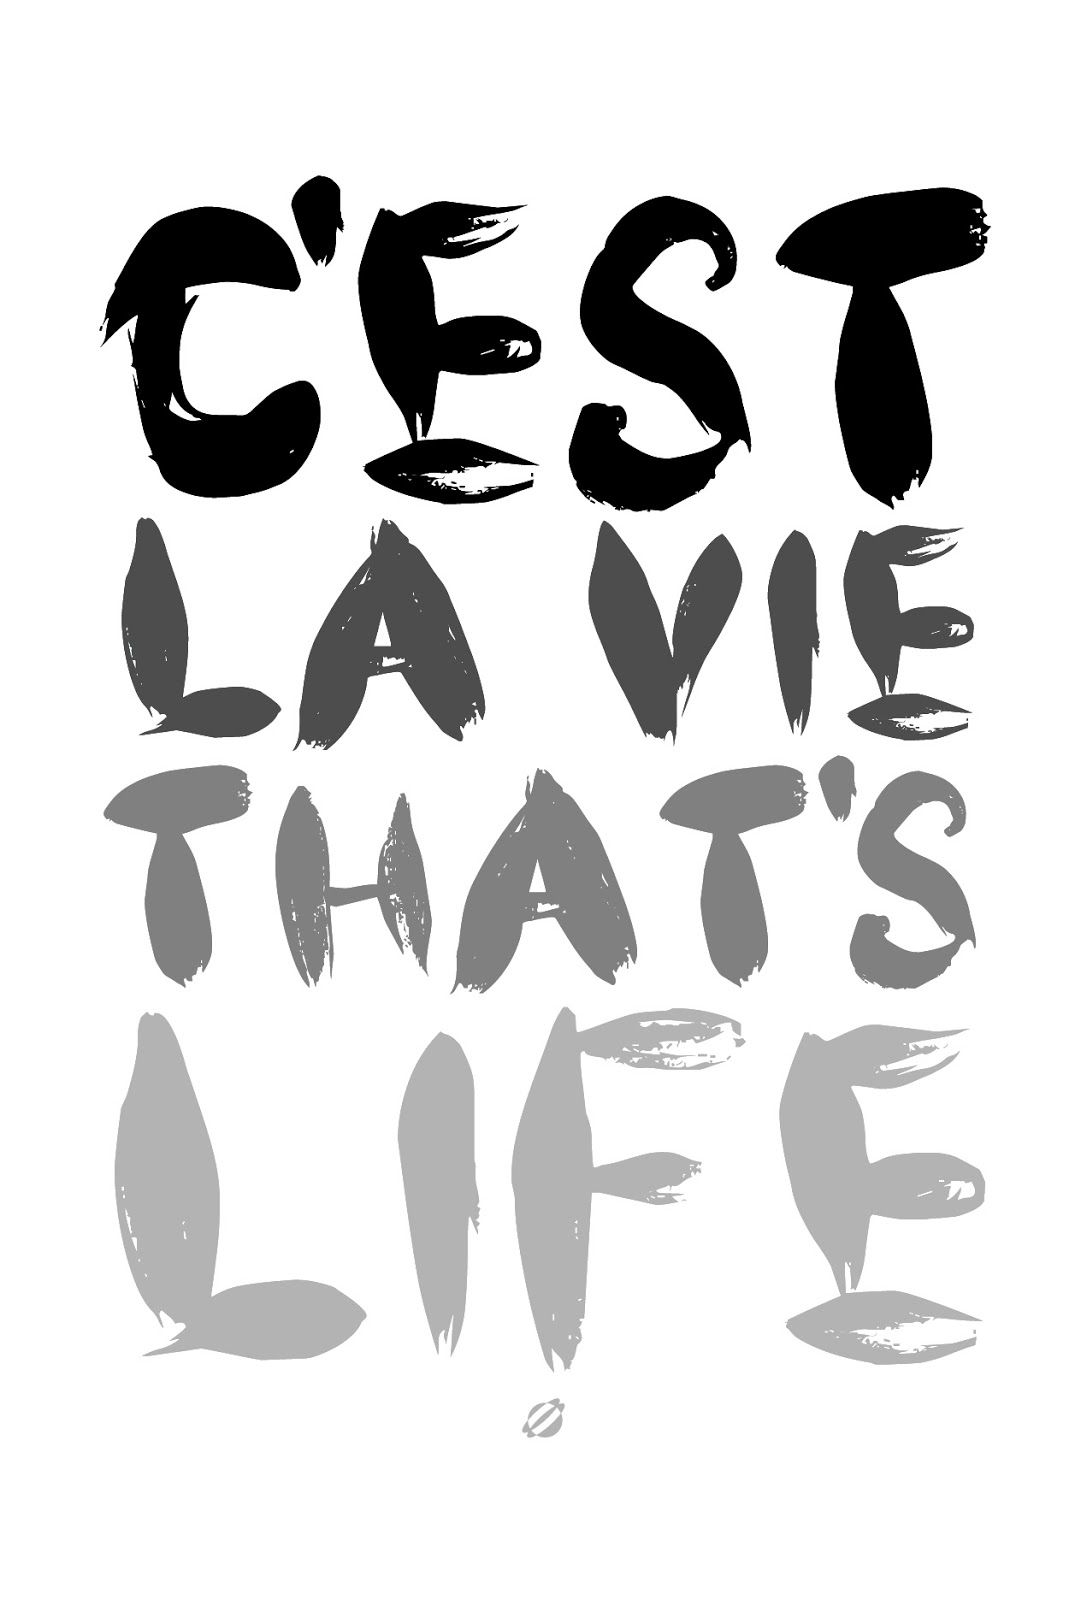 LostBumblebee 2013 C'est la VIE! FREE PRINTABLE